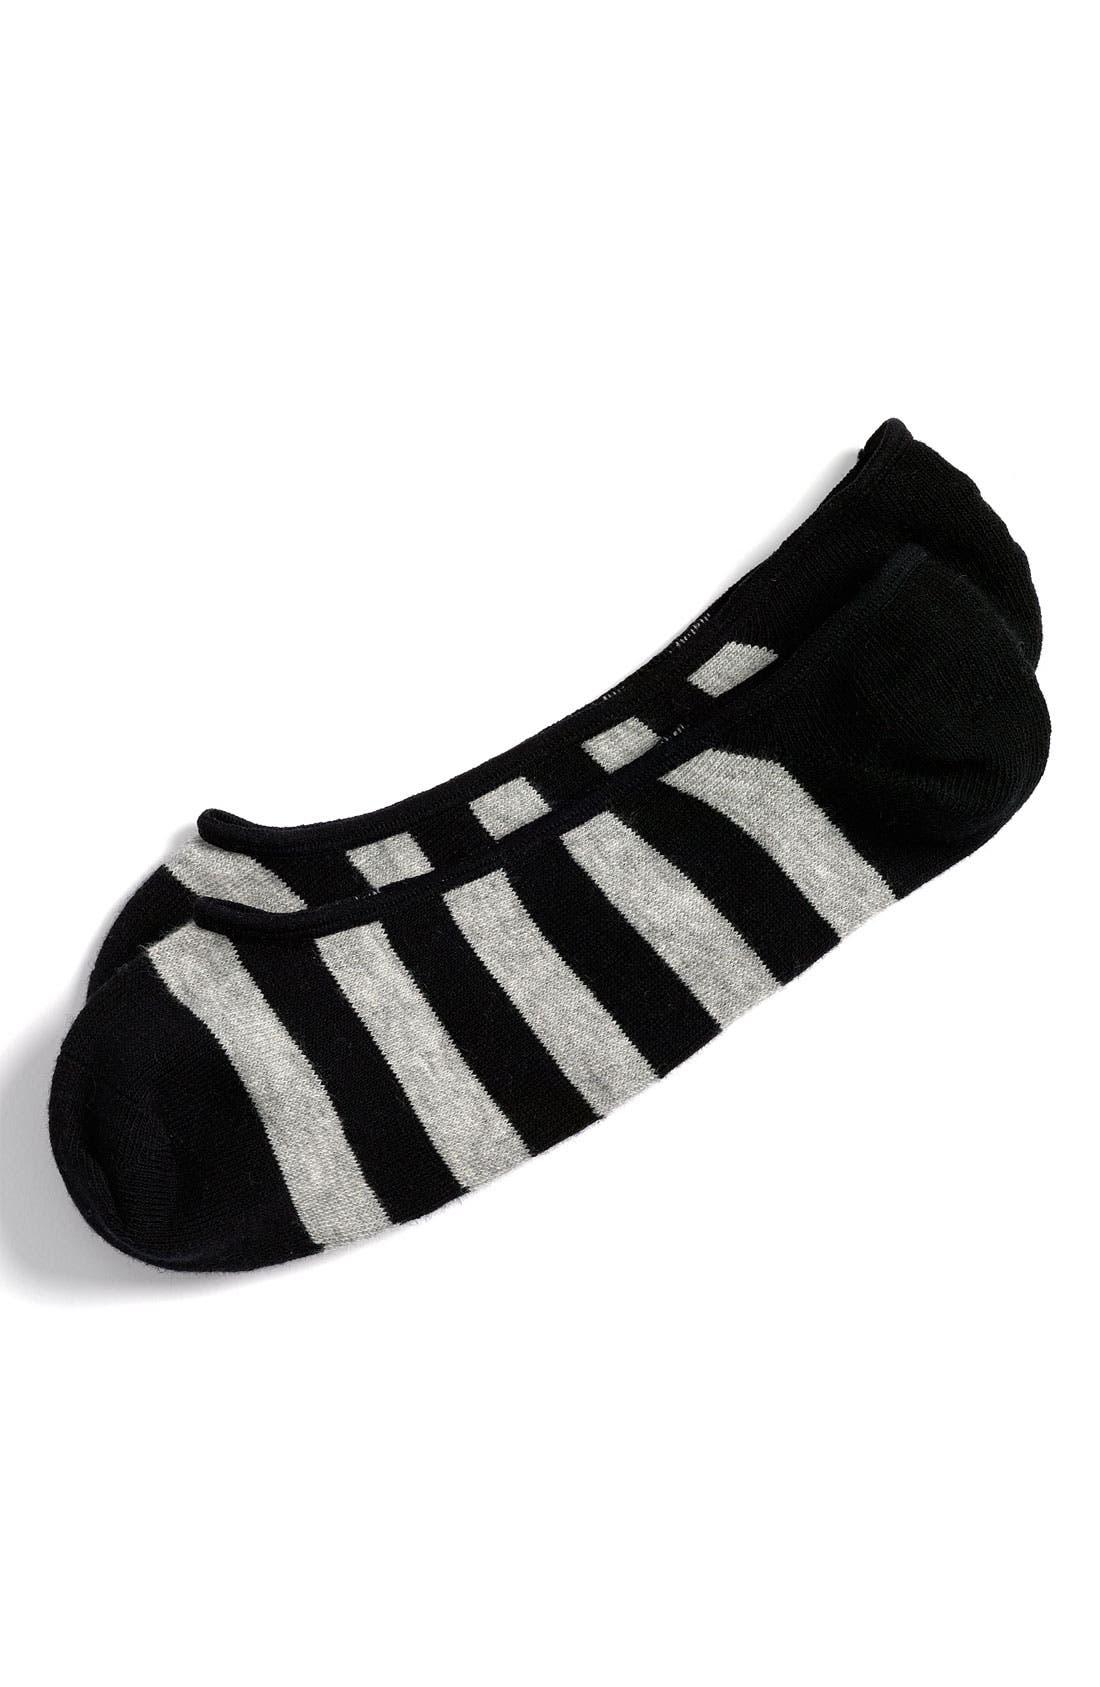 Alternate Image 1 Selected - 1901 'No Show' Liner Socks